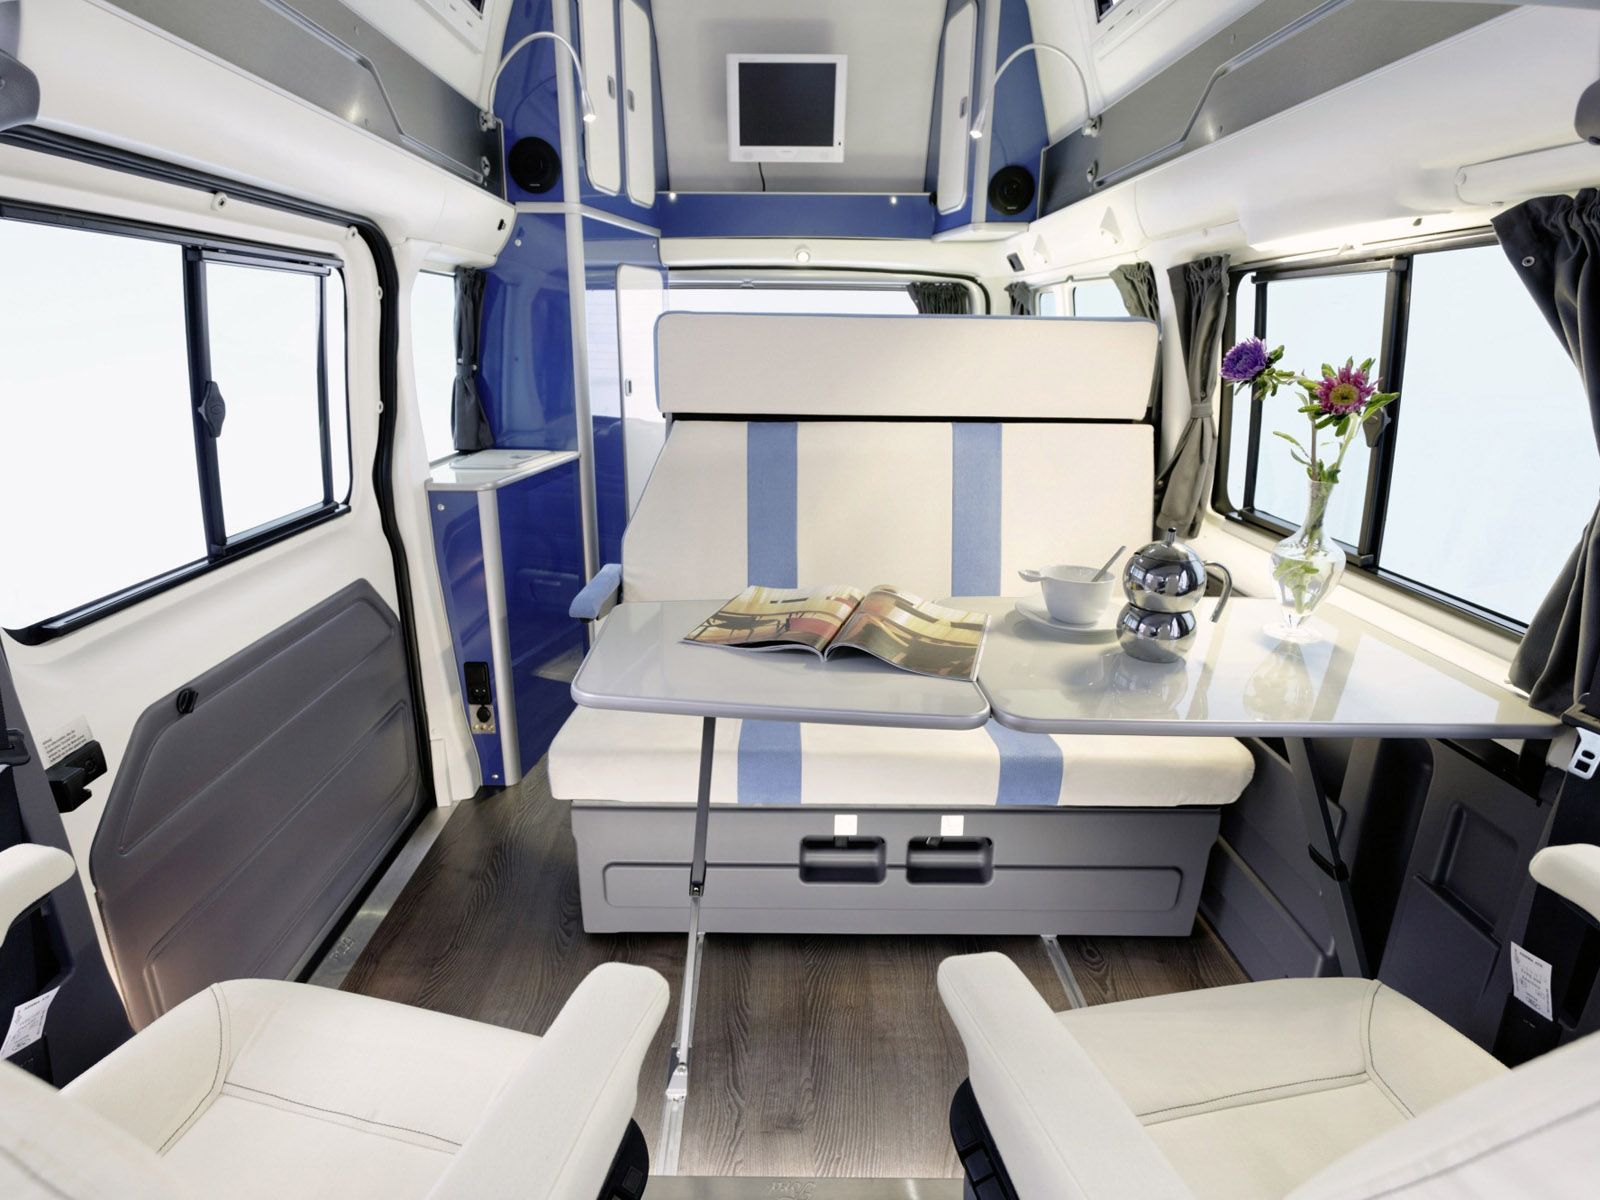 ford nugget photos 7 on better parts ltd. Black Bedroom Furniture Sets. Home Design Ideas